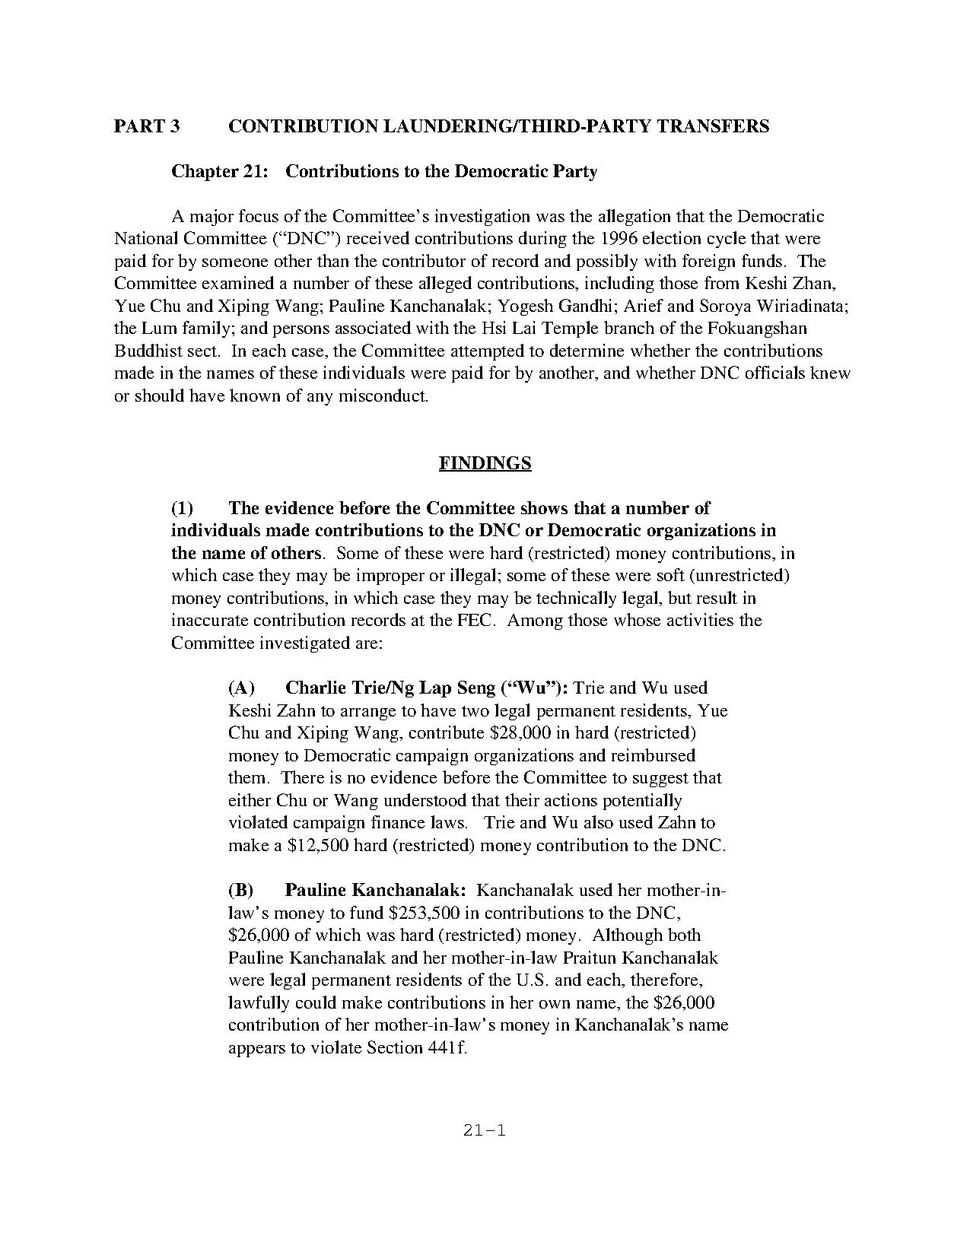 1998 Senate Investigation Contribution Money Laundering.pdf